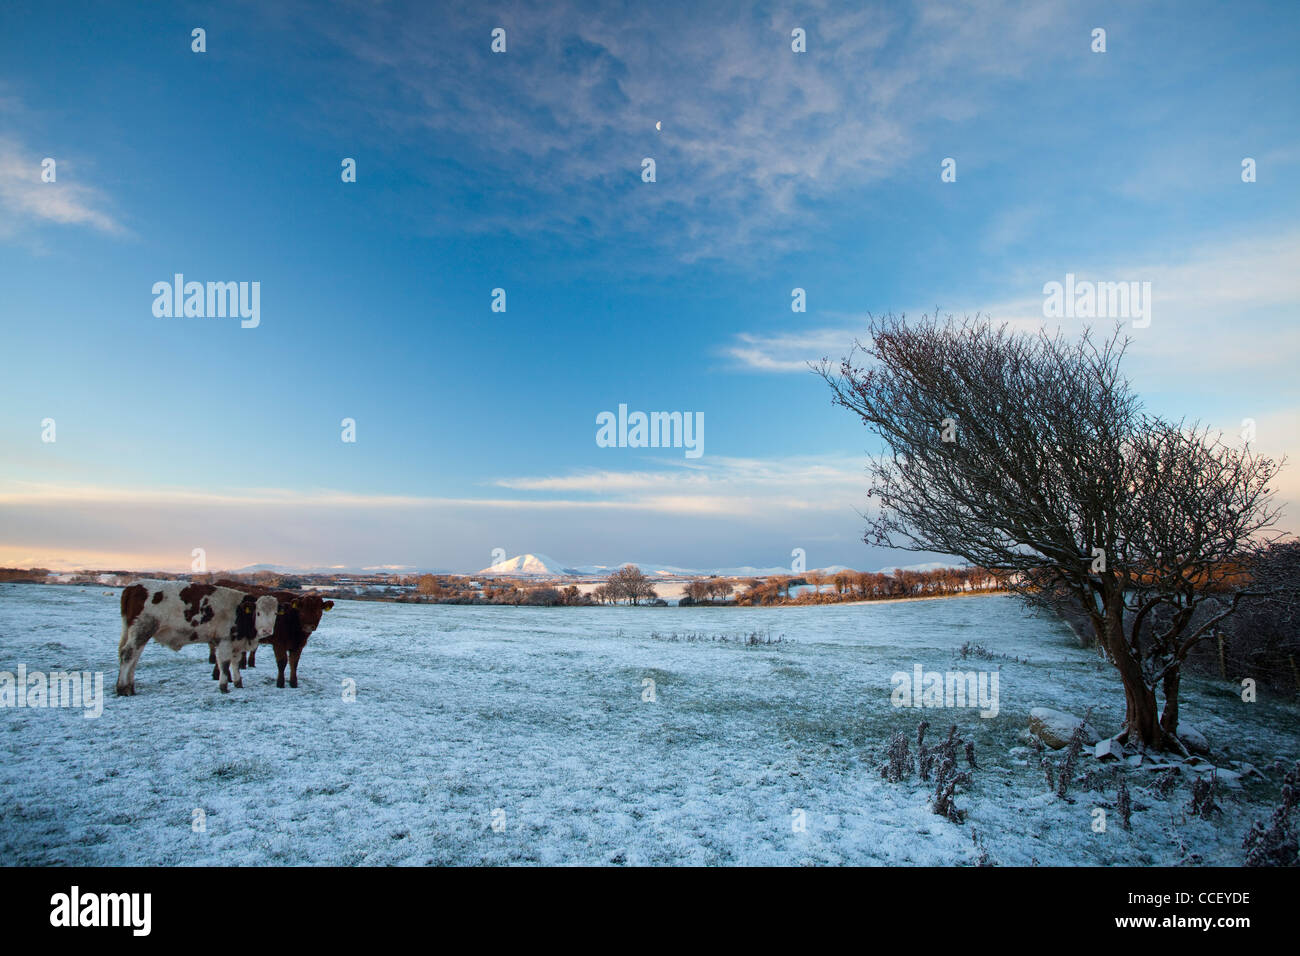 Winter cattle, County Sligo, Ireland. - Stock Image